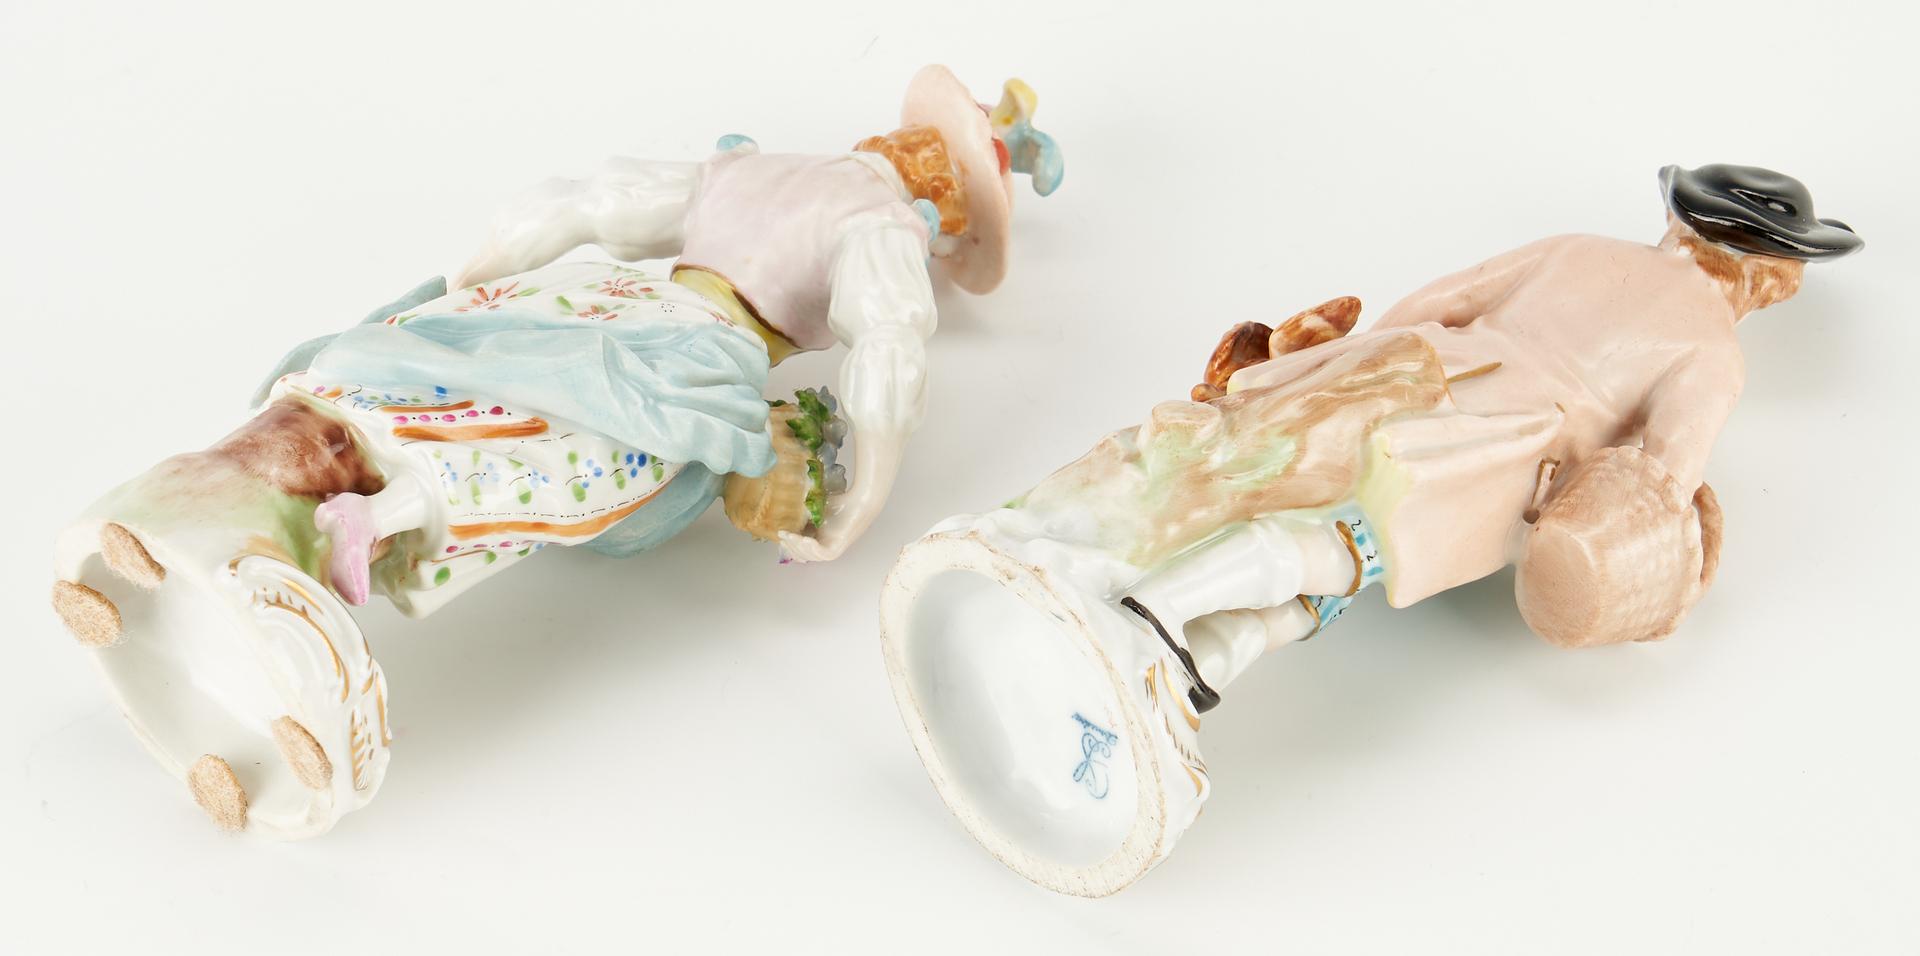 Lot 956: Group of 6 European Porcelain Items